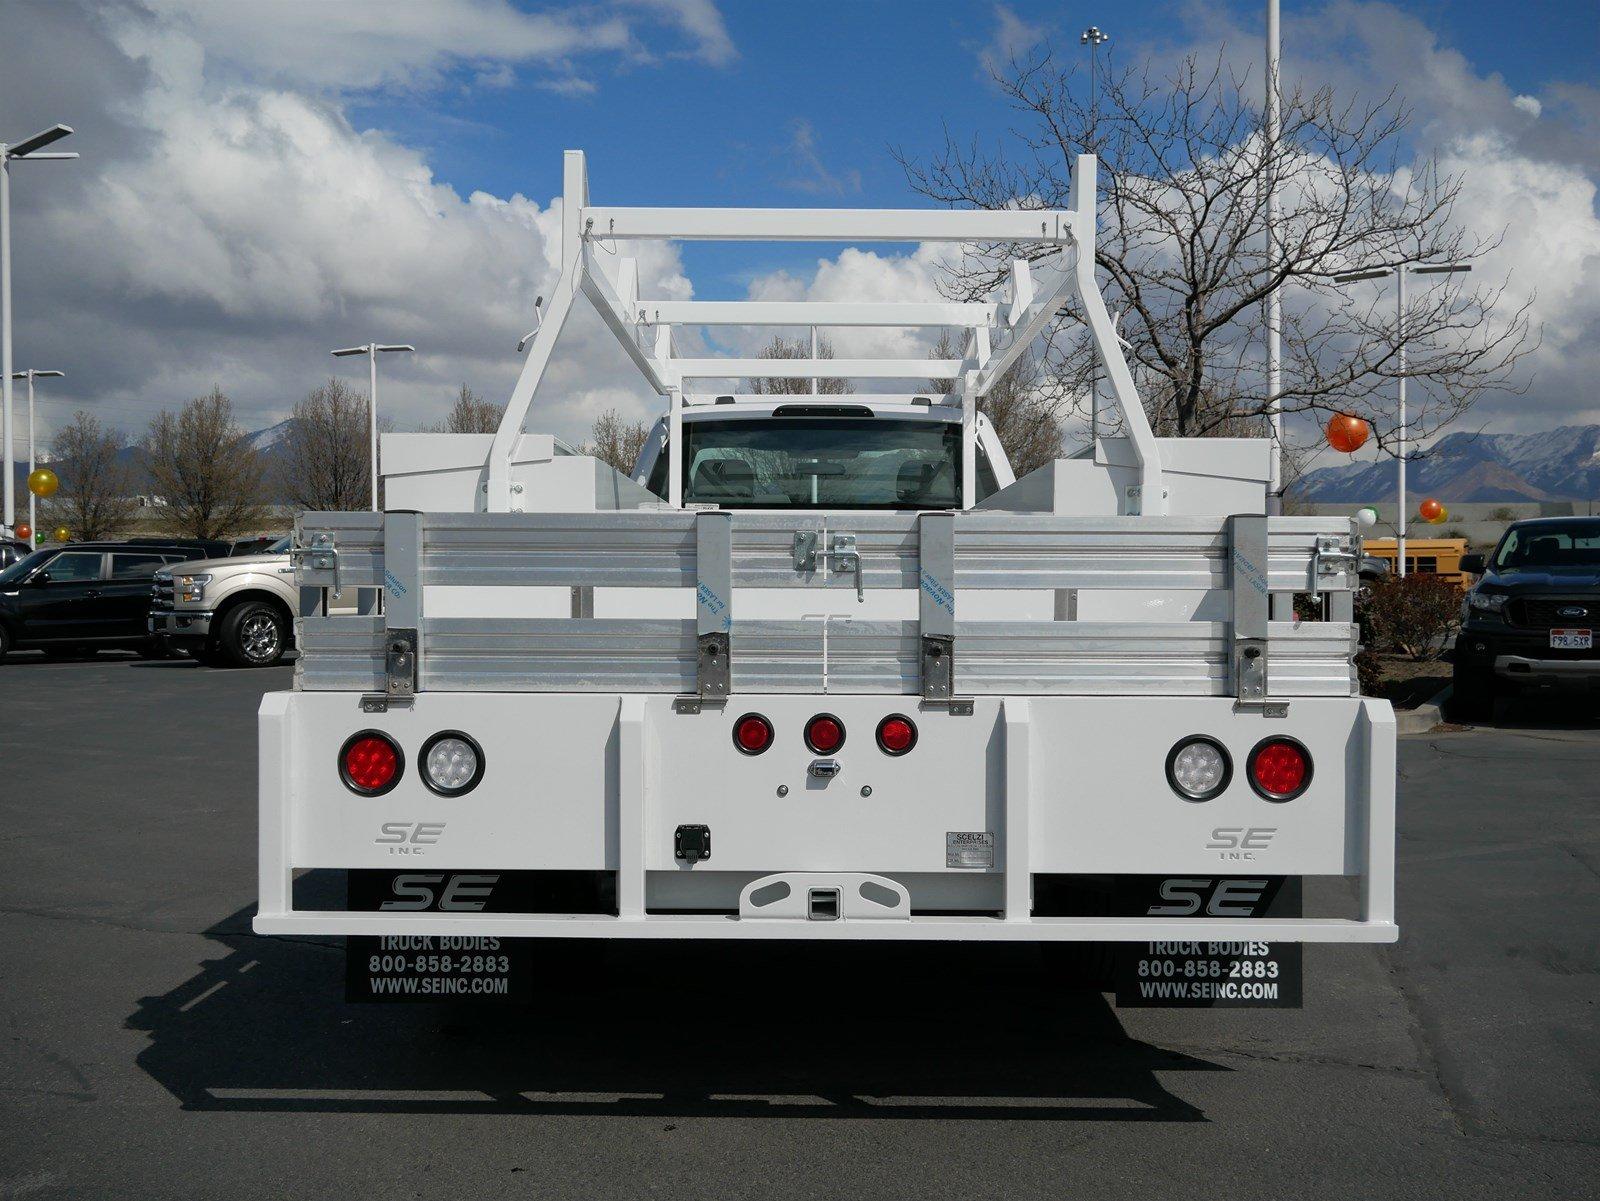 2020 F-550 Regular Cab DRW 4x4, Scelzi SEC Combo Body #63081 - photo 5